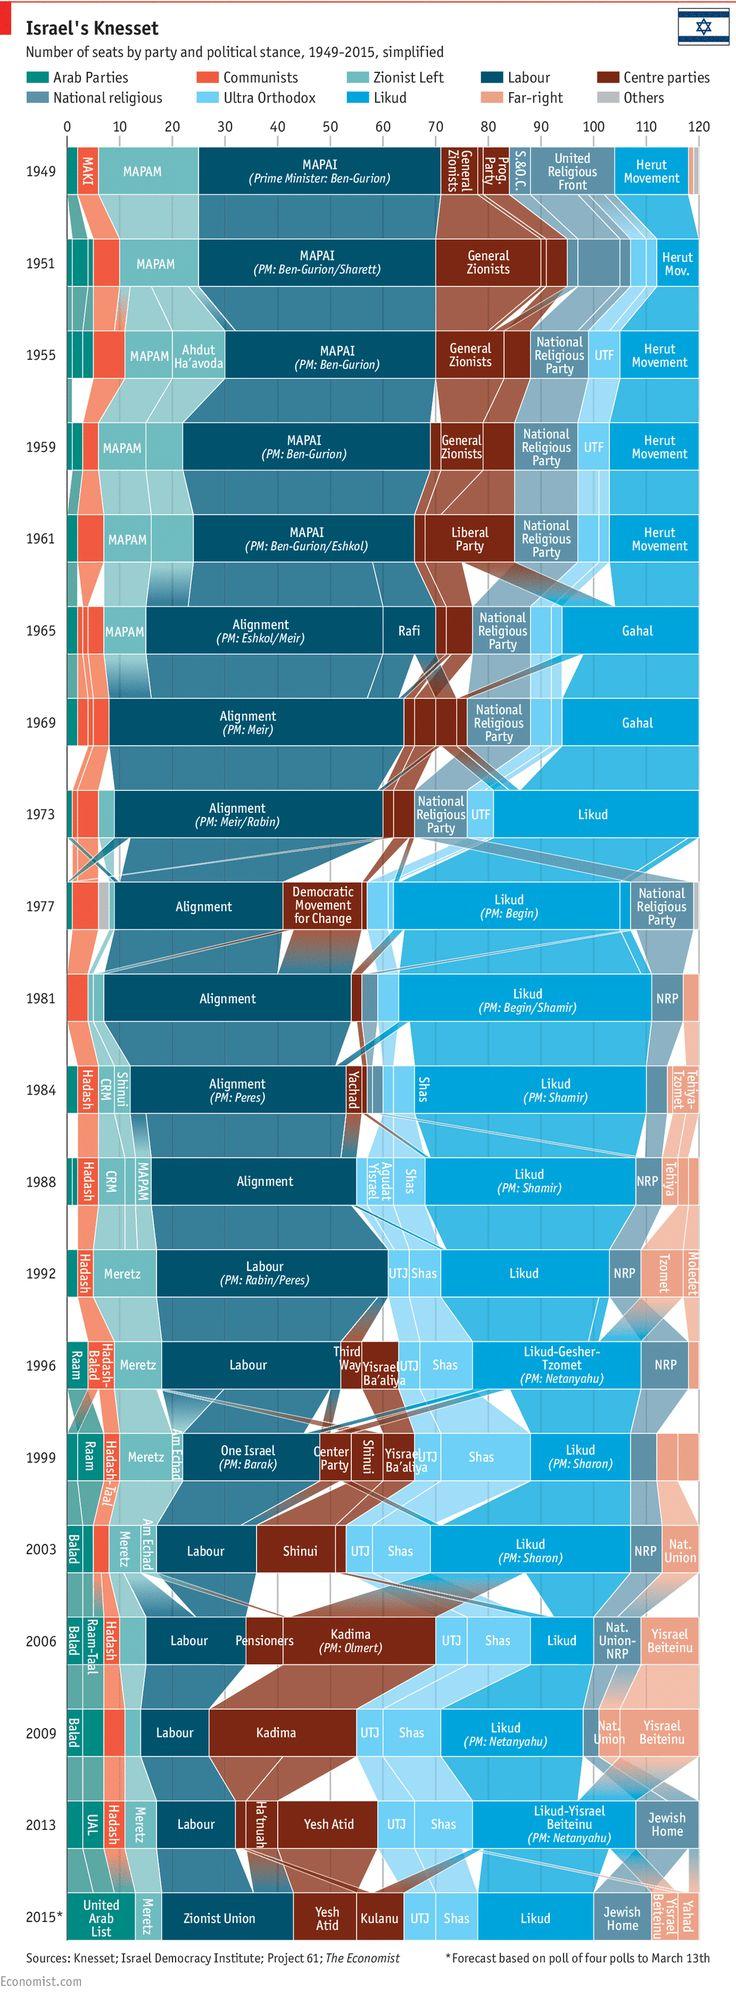 The Economist explains: The evolution of Israeli politics | The Economist